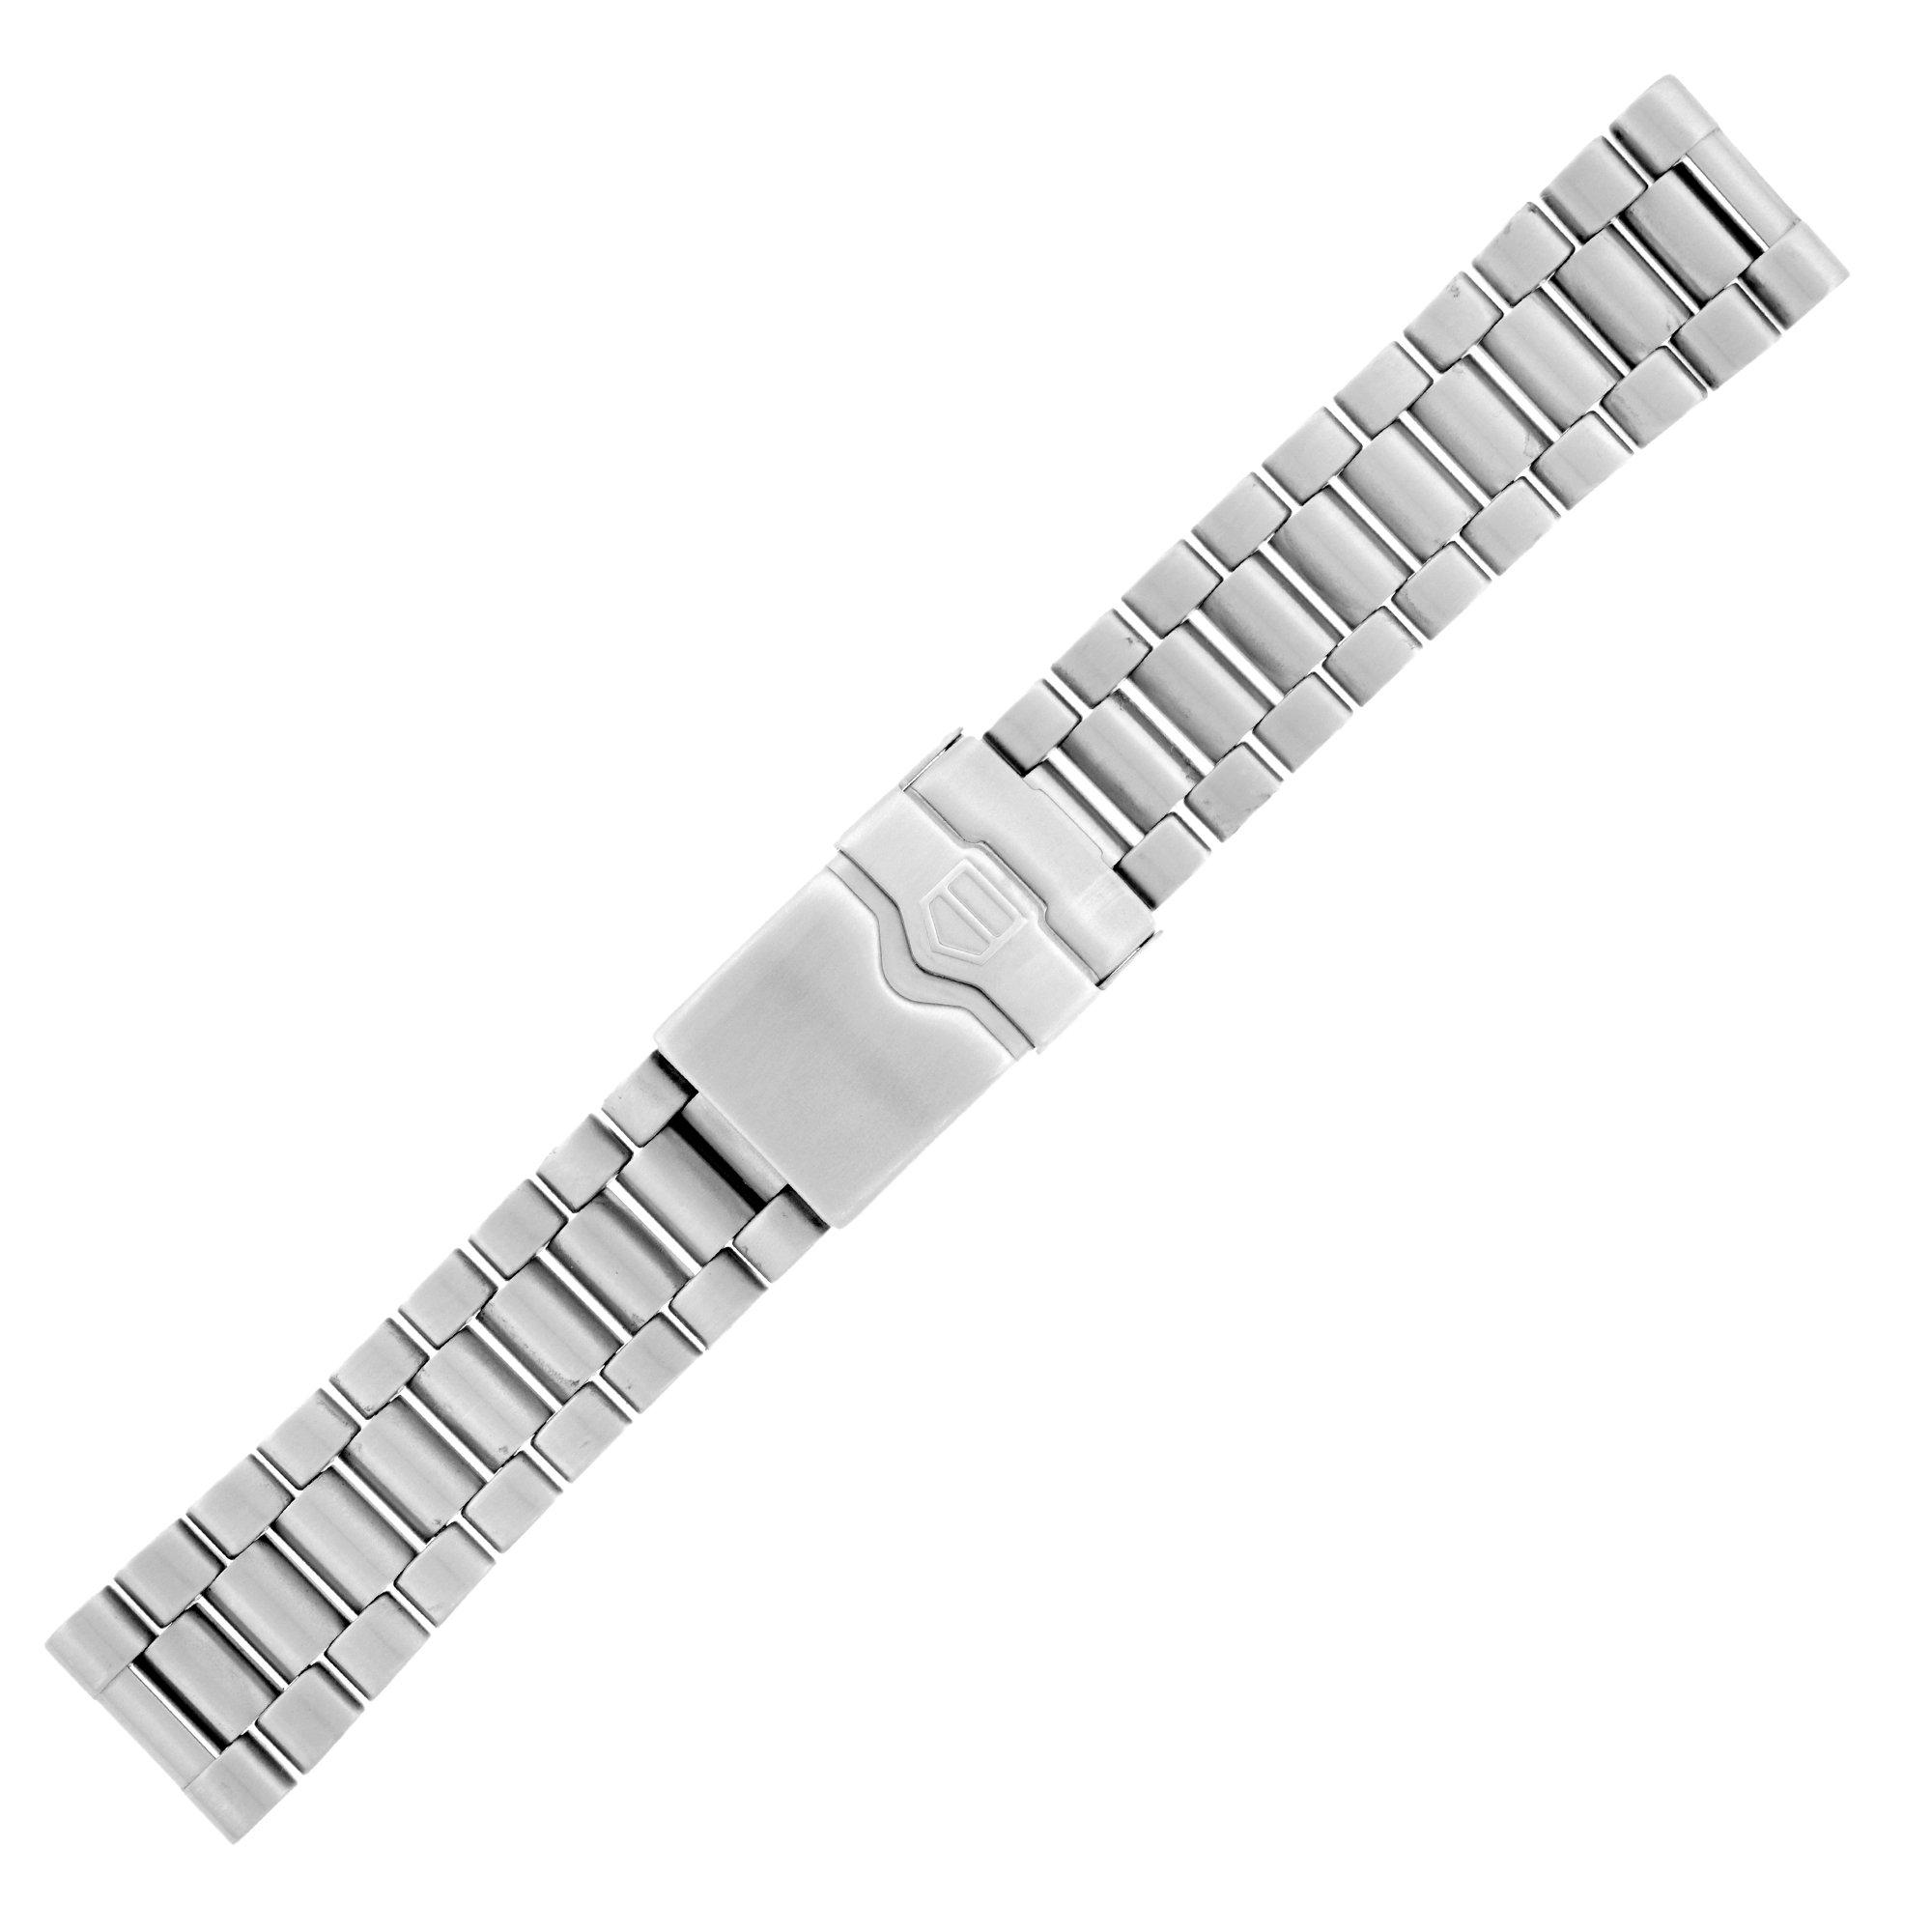 TAG Heuer Formula One 20MM Steel Bracelet BA0850 / BA0858 by TAG Heuer